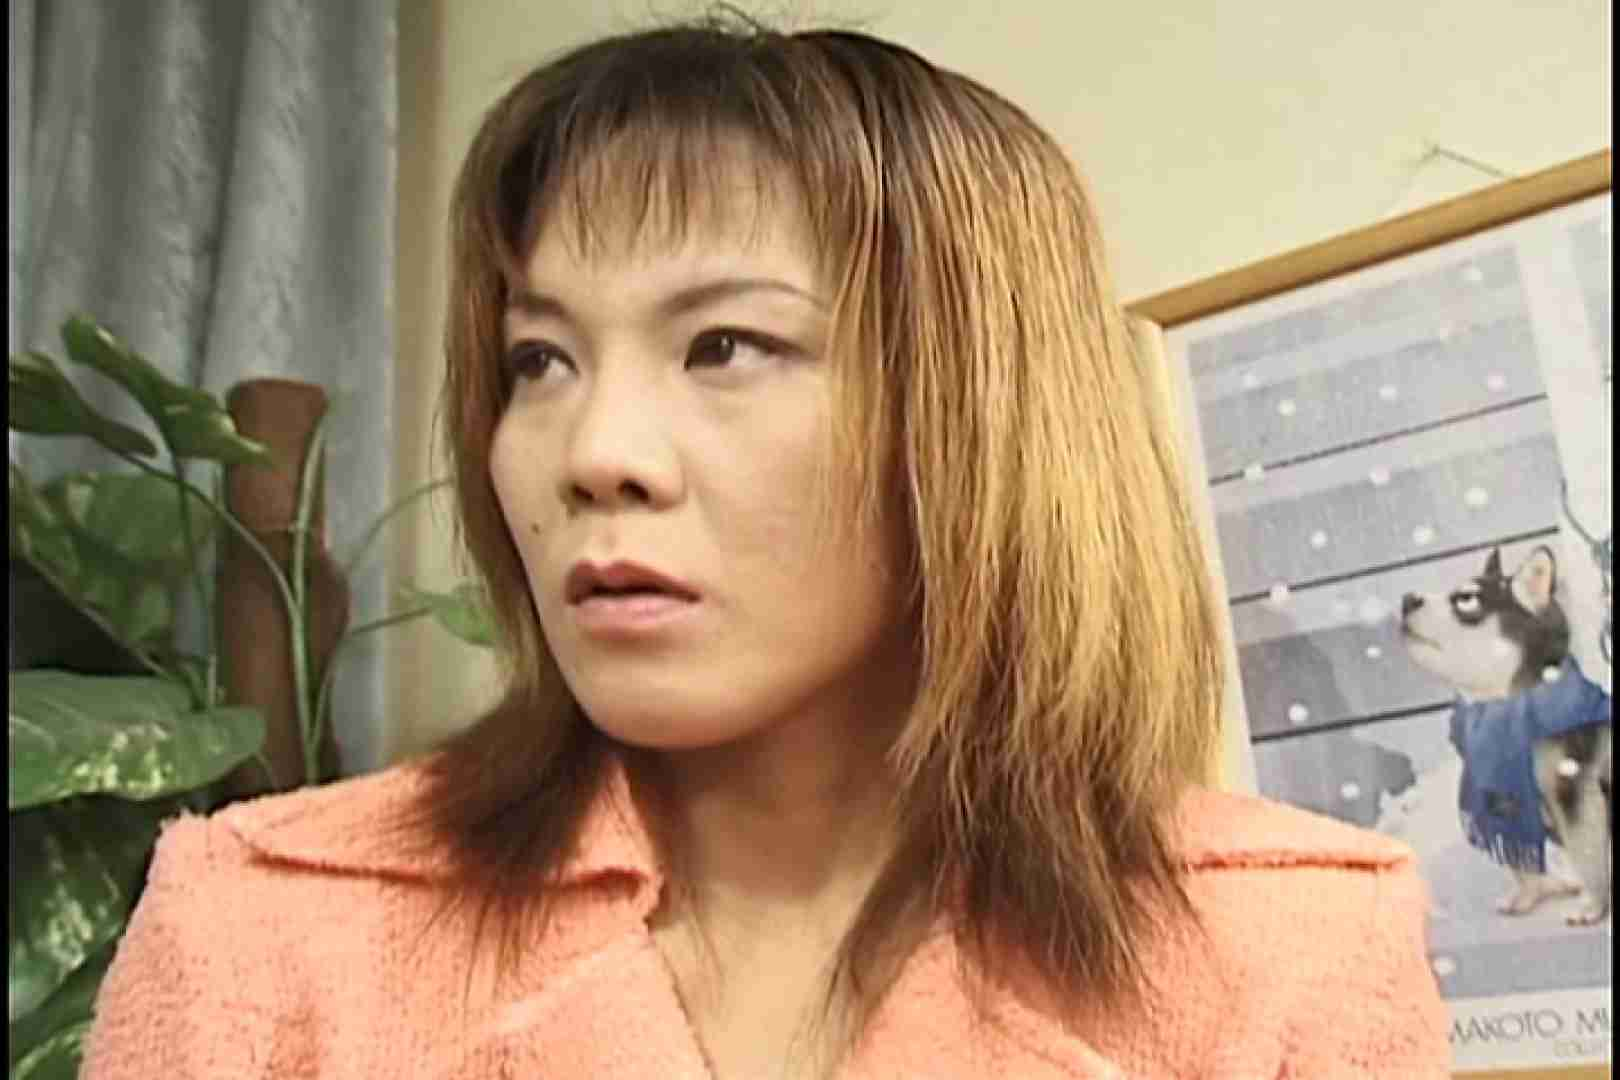 昼間の奥様は欲求不満 ~桜井昌子~ フェラ SEX無修正画像 60連発 17